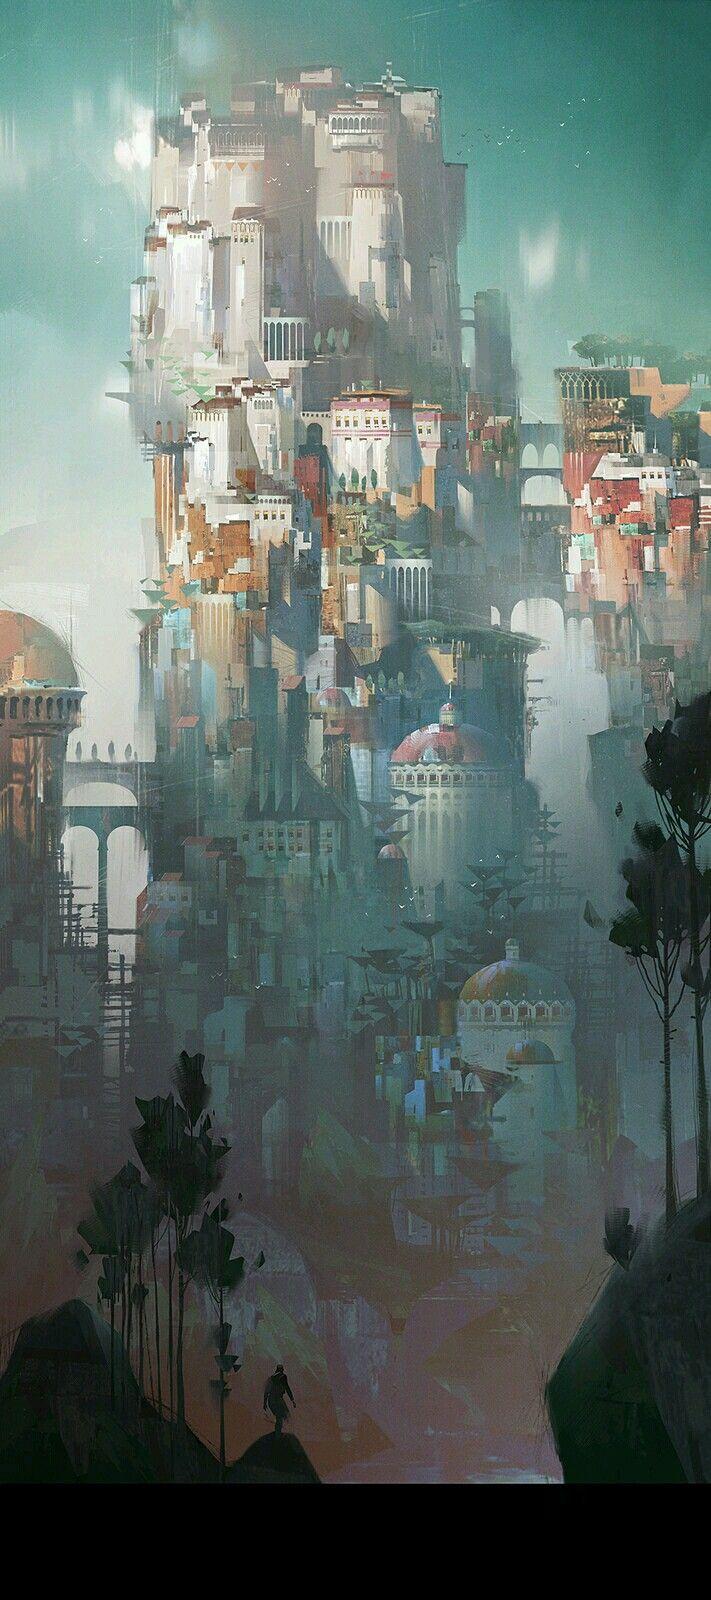 17 best ideas about science fiction art on pinterest for Sci fi decor